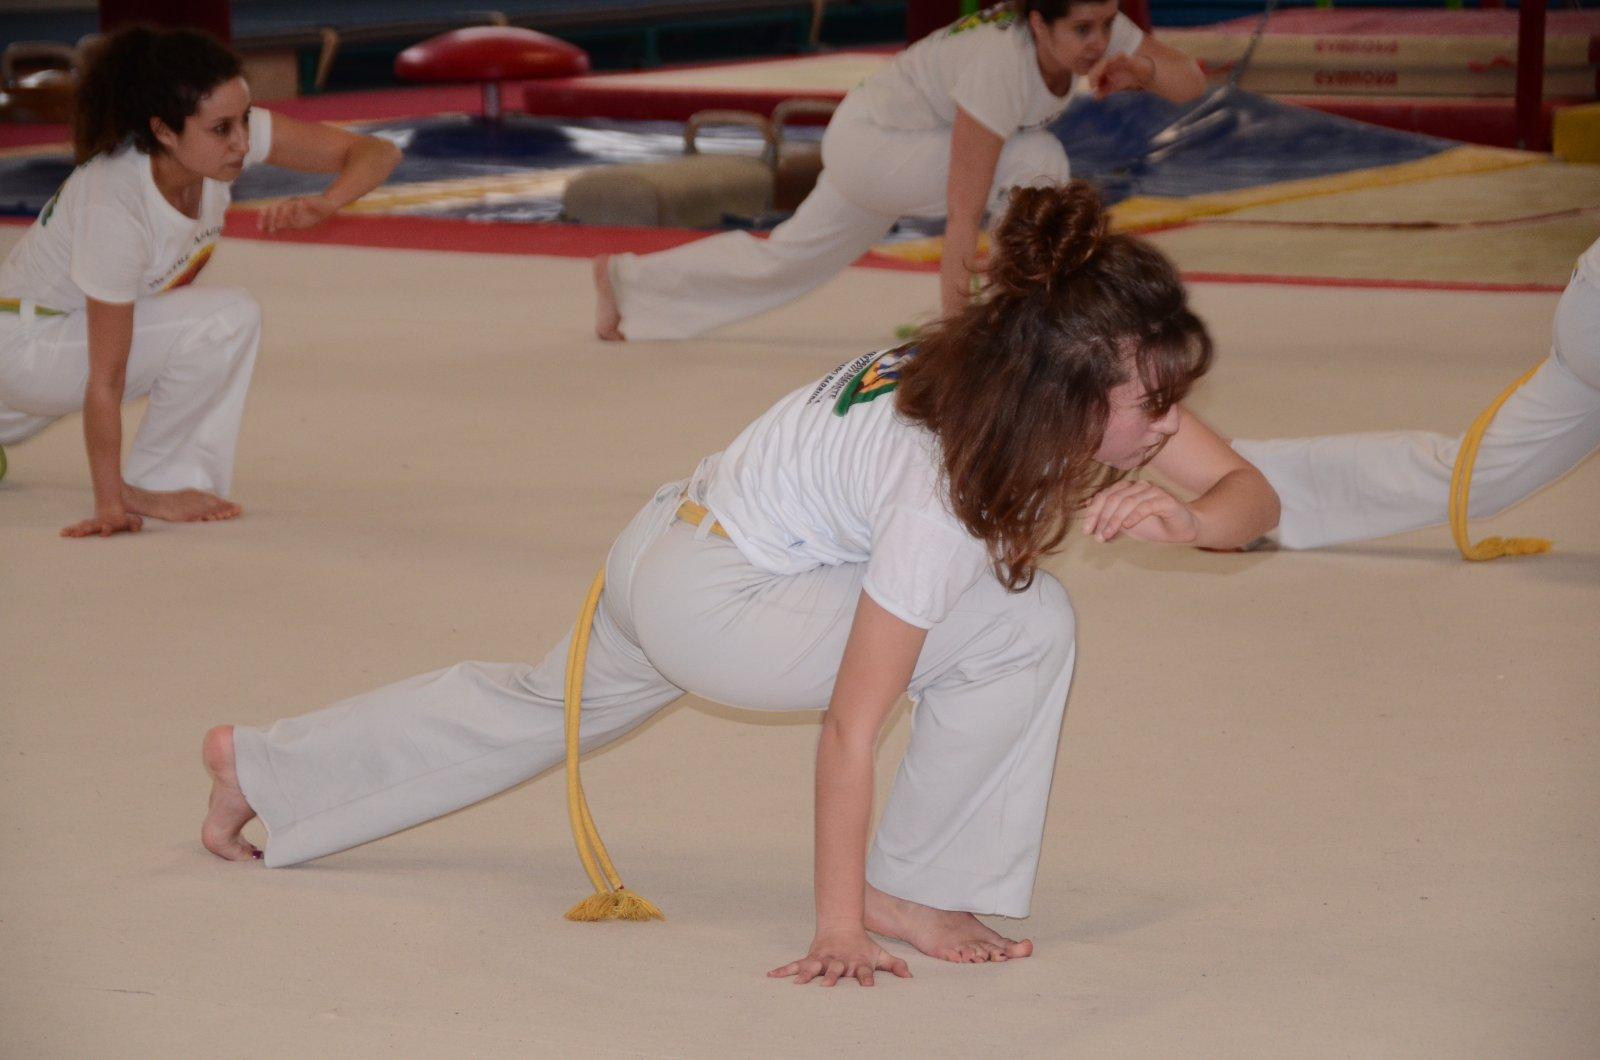 Roda E Galette 2018 Capoeira Nantes (18)